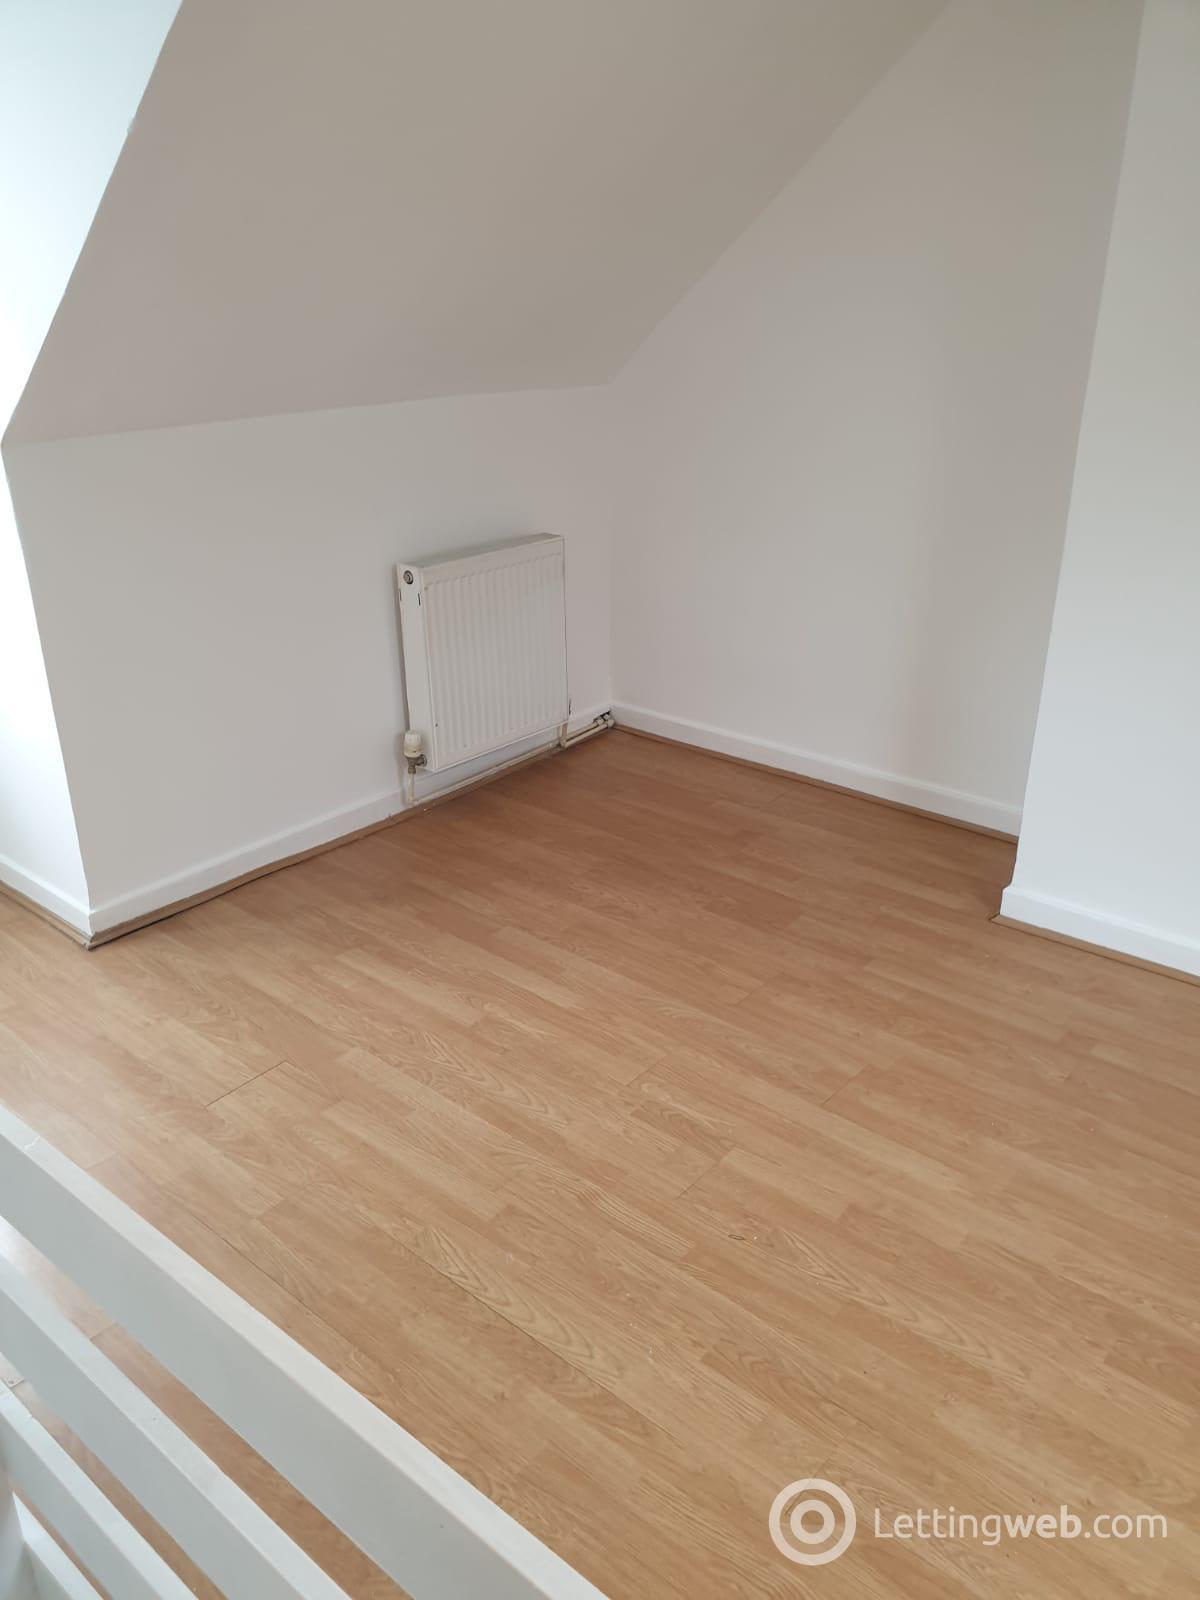 Property to rent in Dean Street, Kilmarnock, KA3 1EL